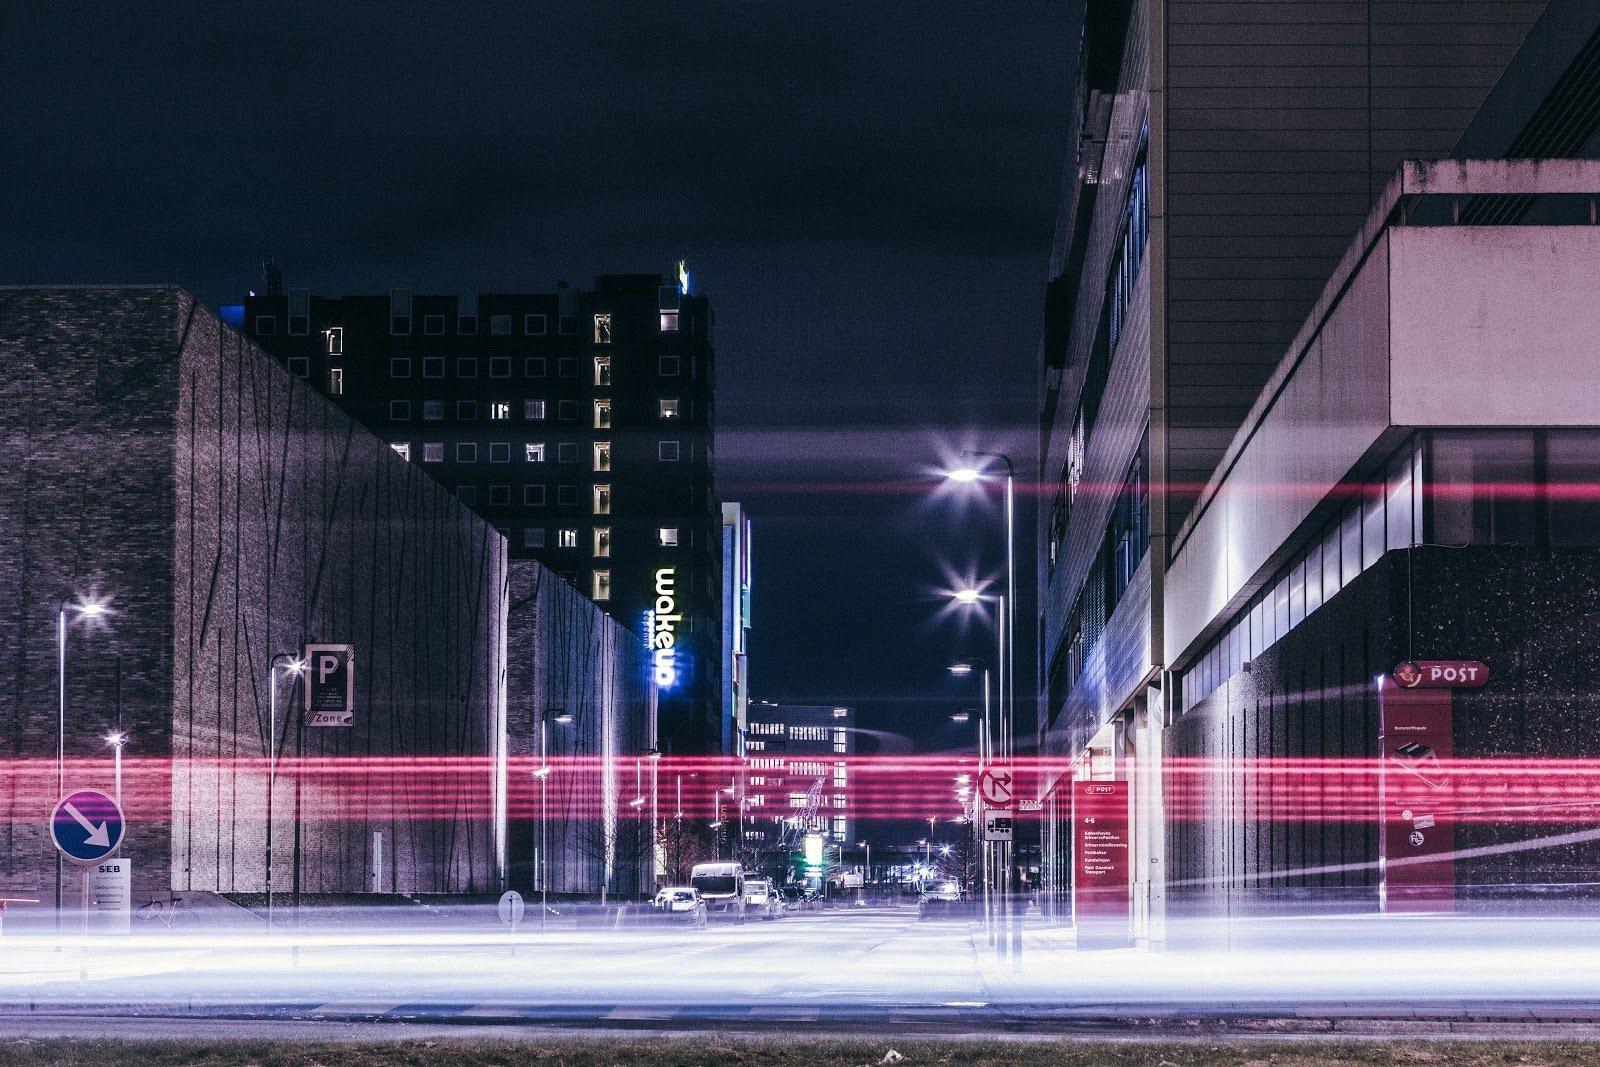 Urban shot of a city street with light streaks by Sandro Katalina